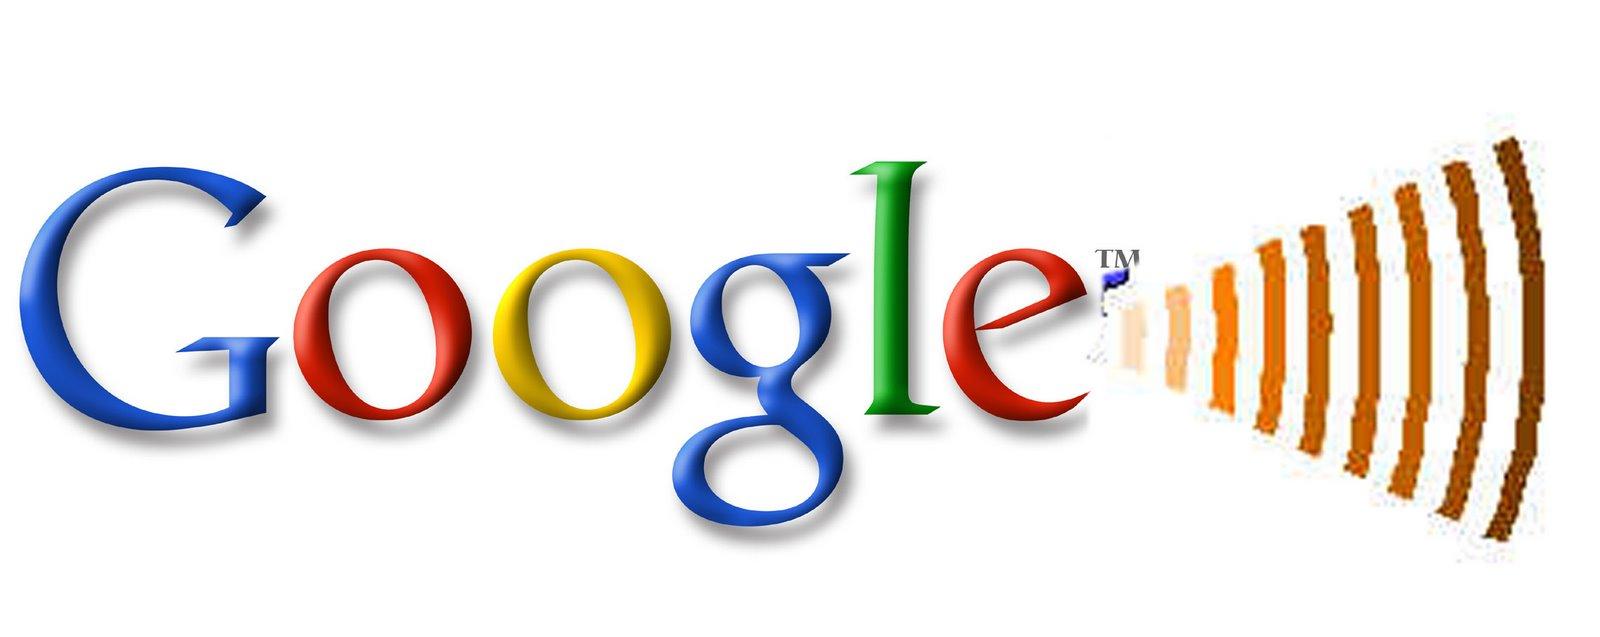 [google_logo.jpg]